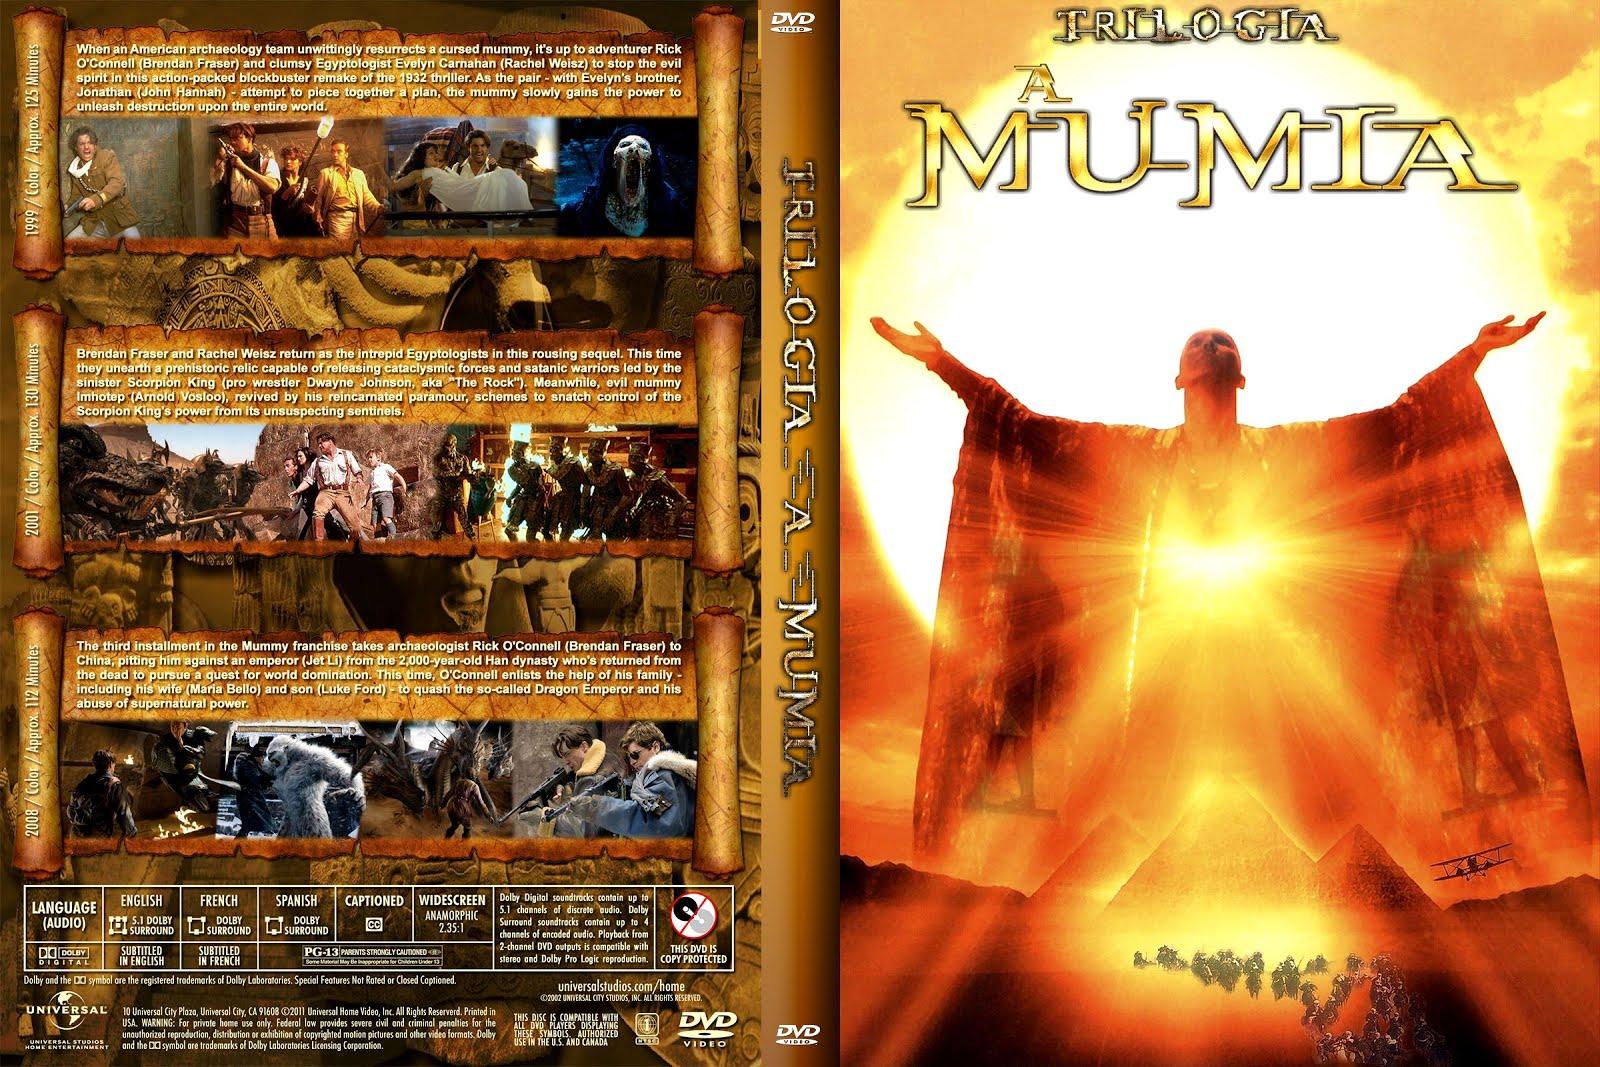 Download Trilogia A Múmia BDRip XviD Dual Áudio  255BShare 2BCapas 2BFornari 255DTRILOGIA A MUMIA